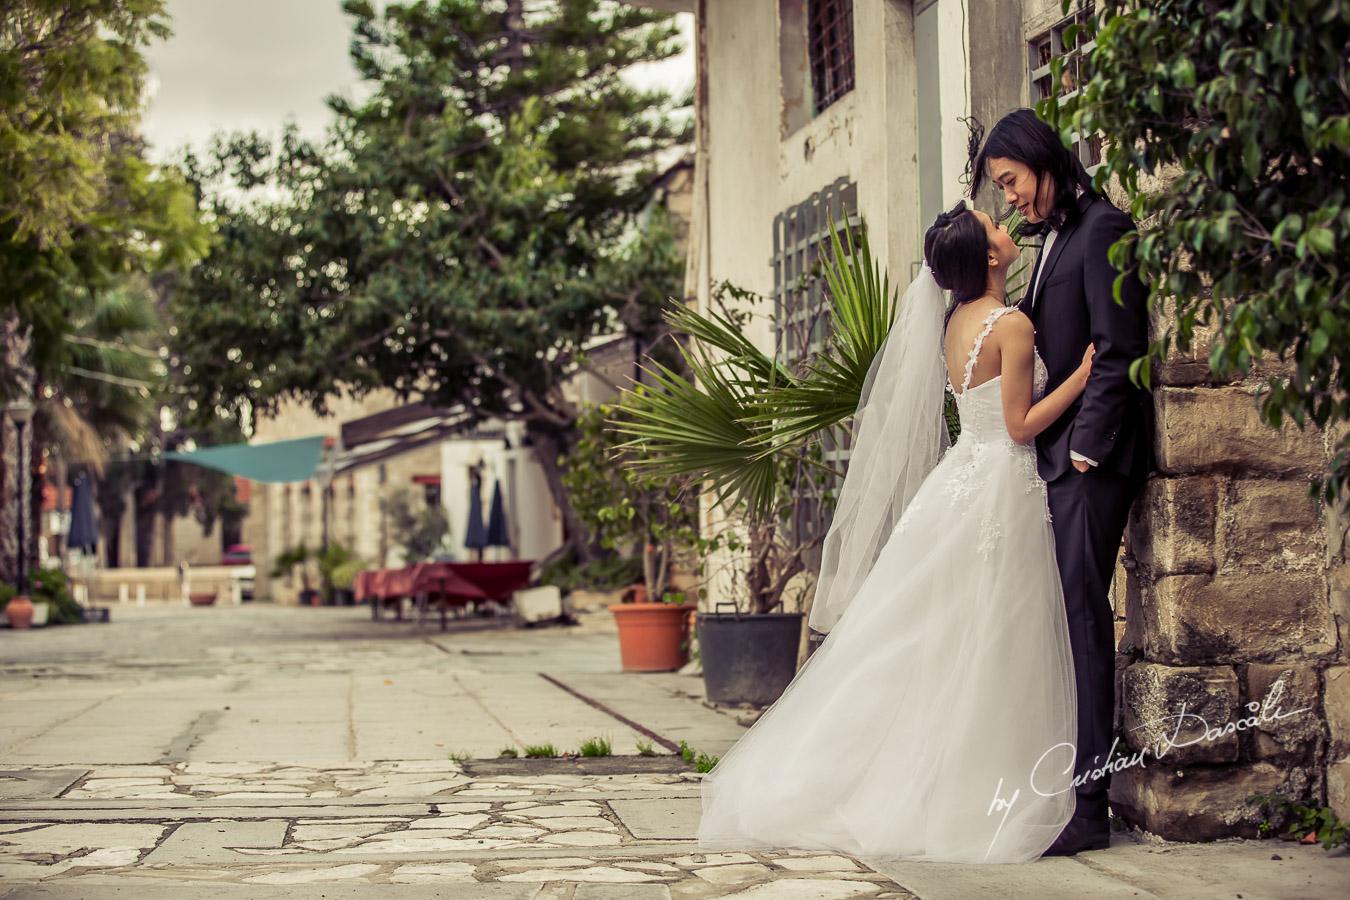 Pre Wedding Photoshoot in Cyprus - 06